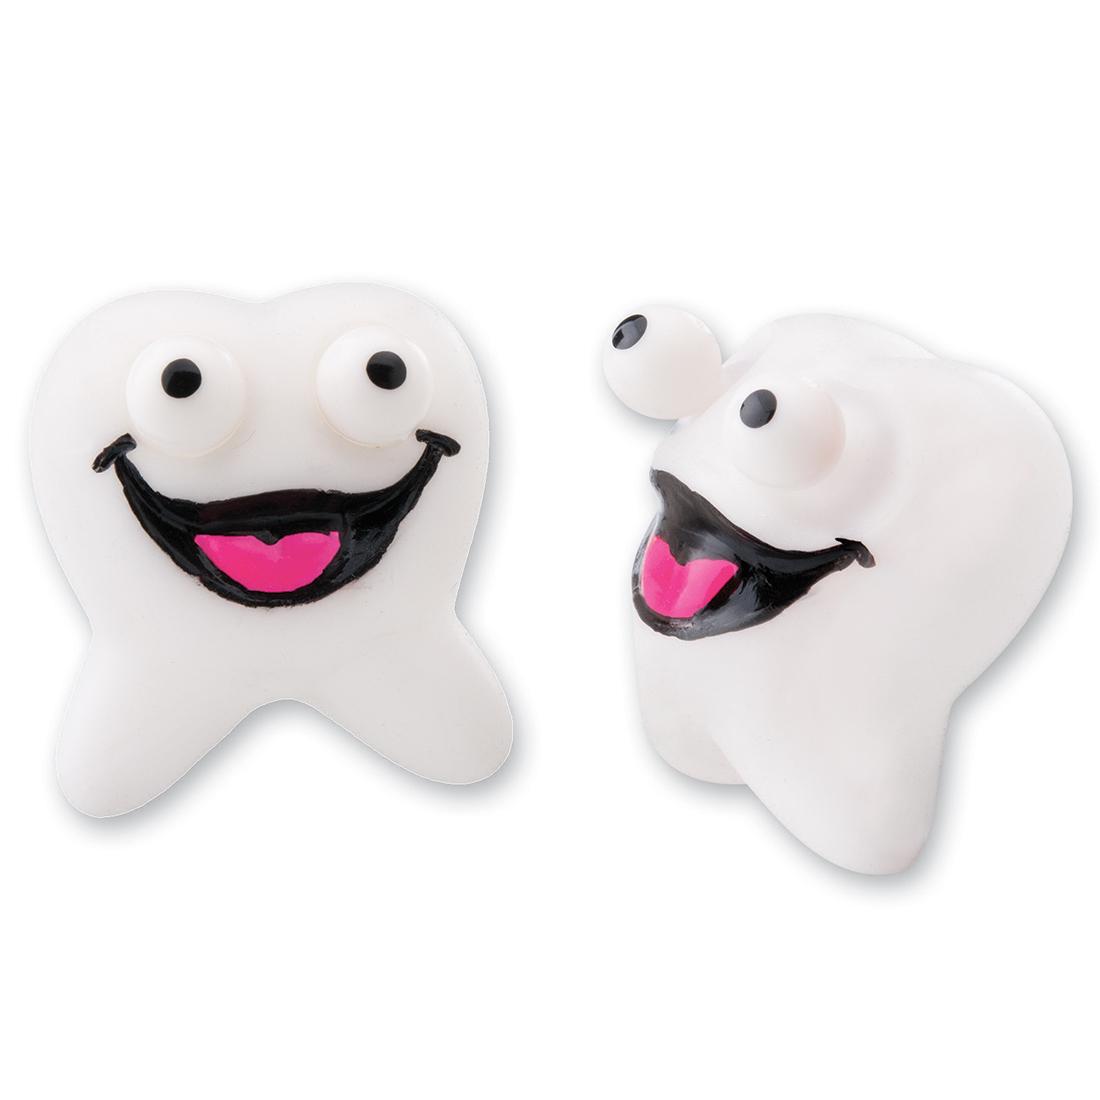 Dental Themed Prizes